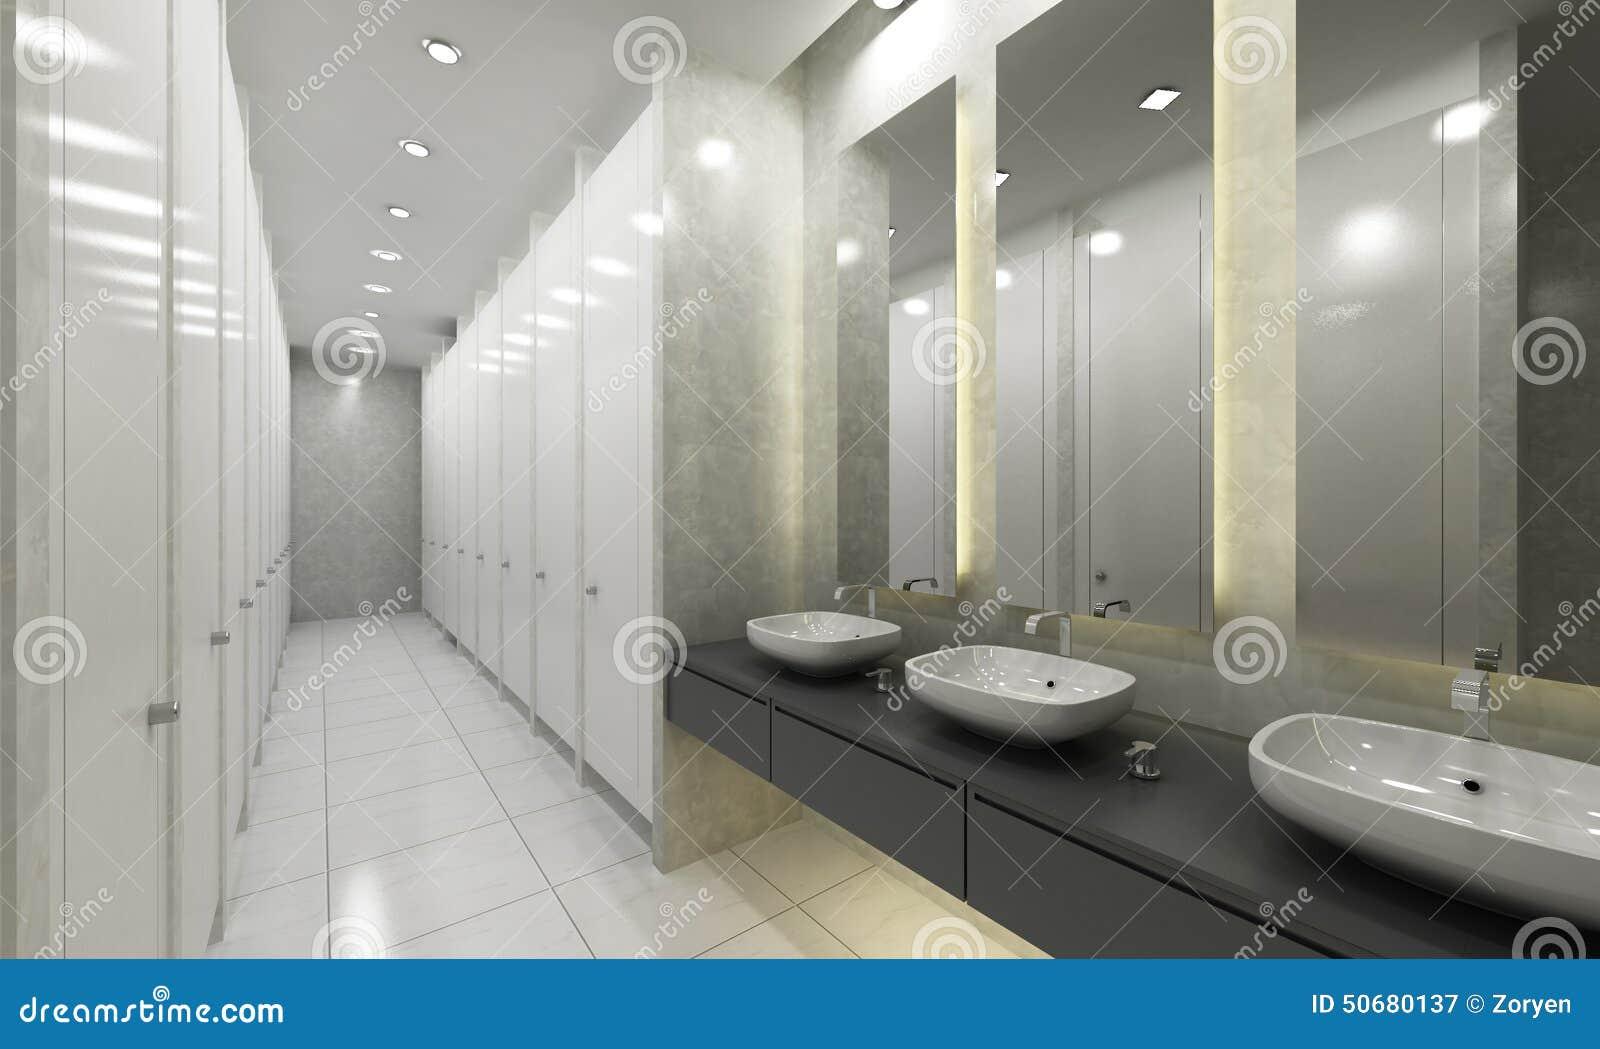 Modern washroom and toilets stock image image of for Washroom photo